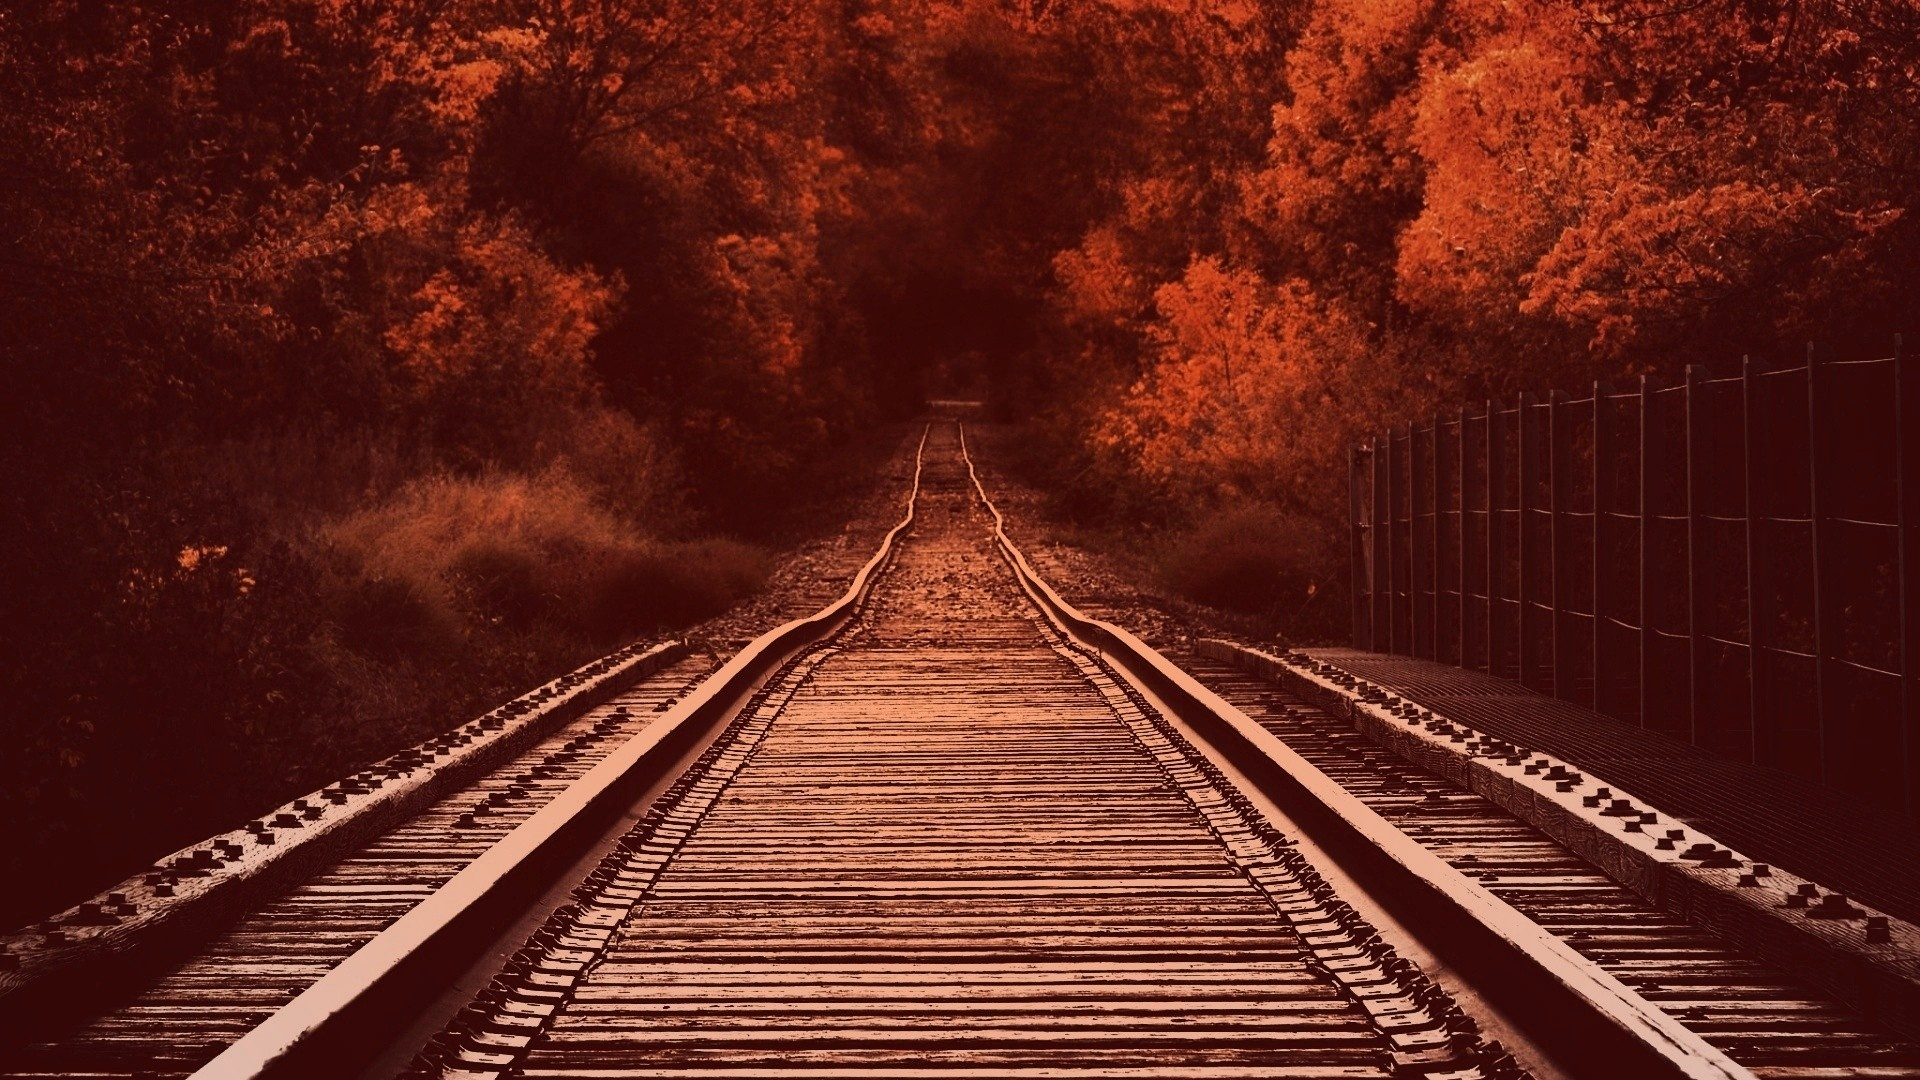 Railroad wallpaper for desktop